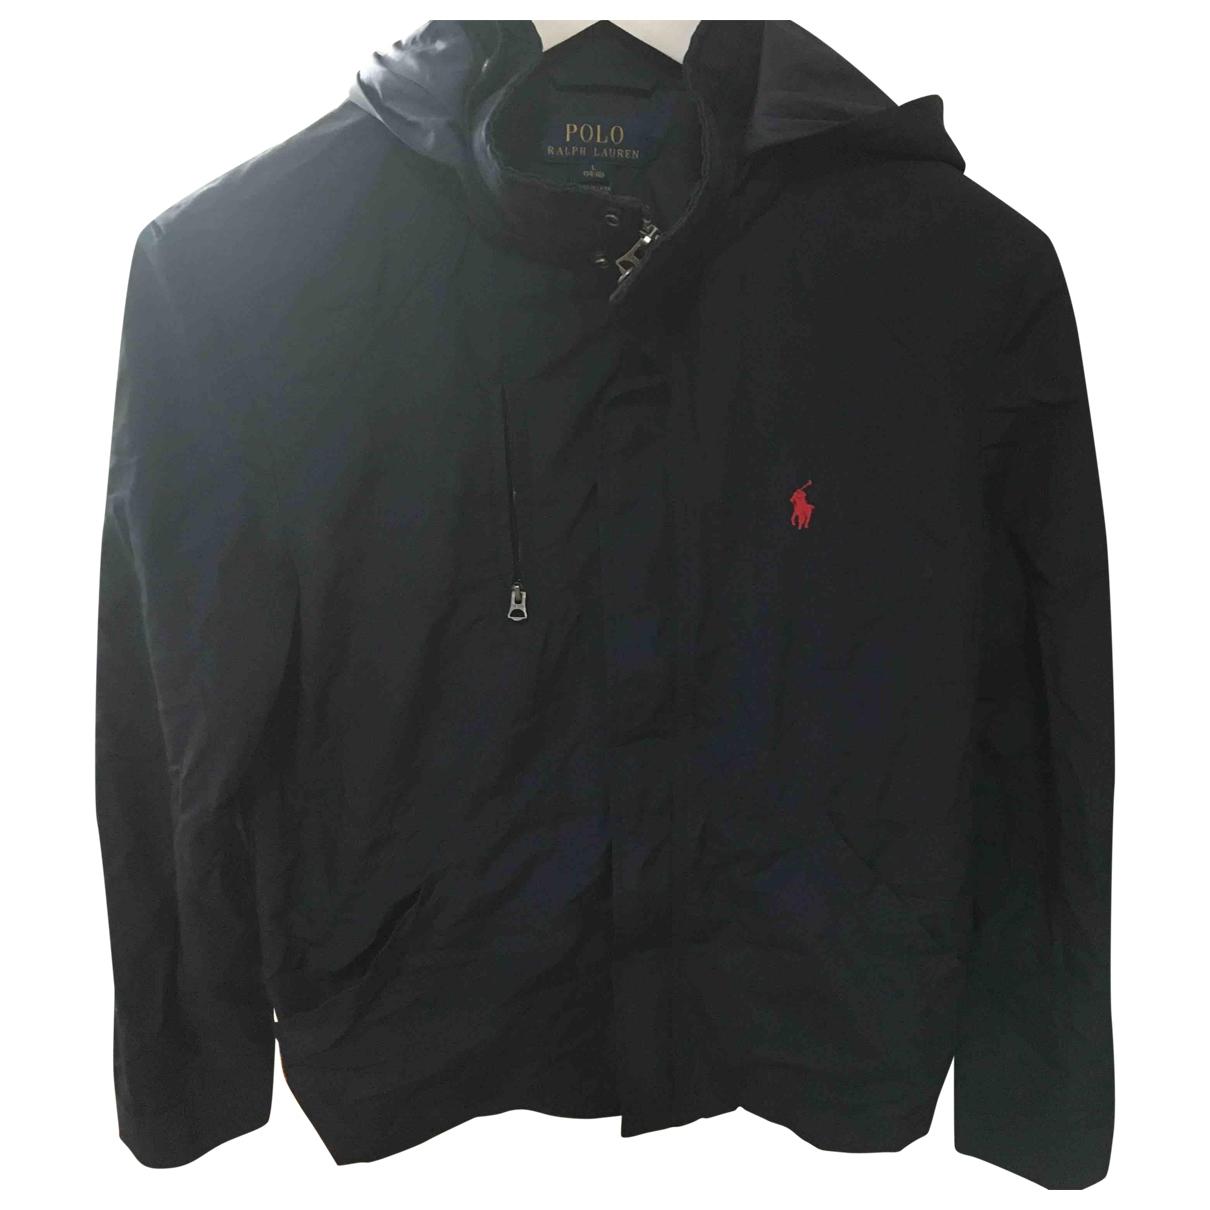 Polo Ralph Lauren \N Blue jacket & coat for Kids 14 years - S FR